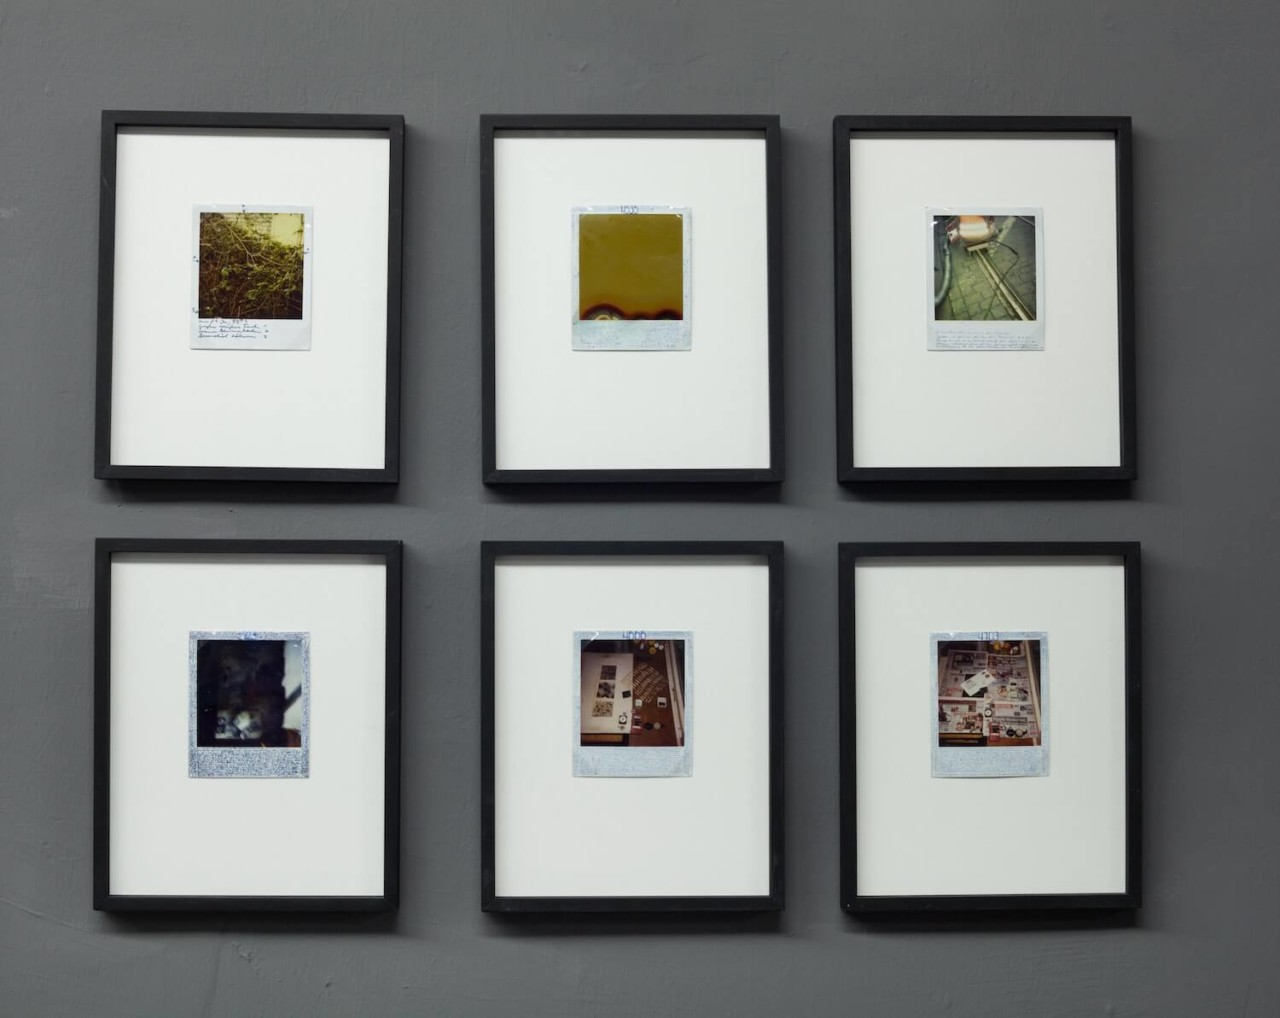 EBENSPERGER RHOMBERG Delmes & Zander Installation Views